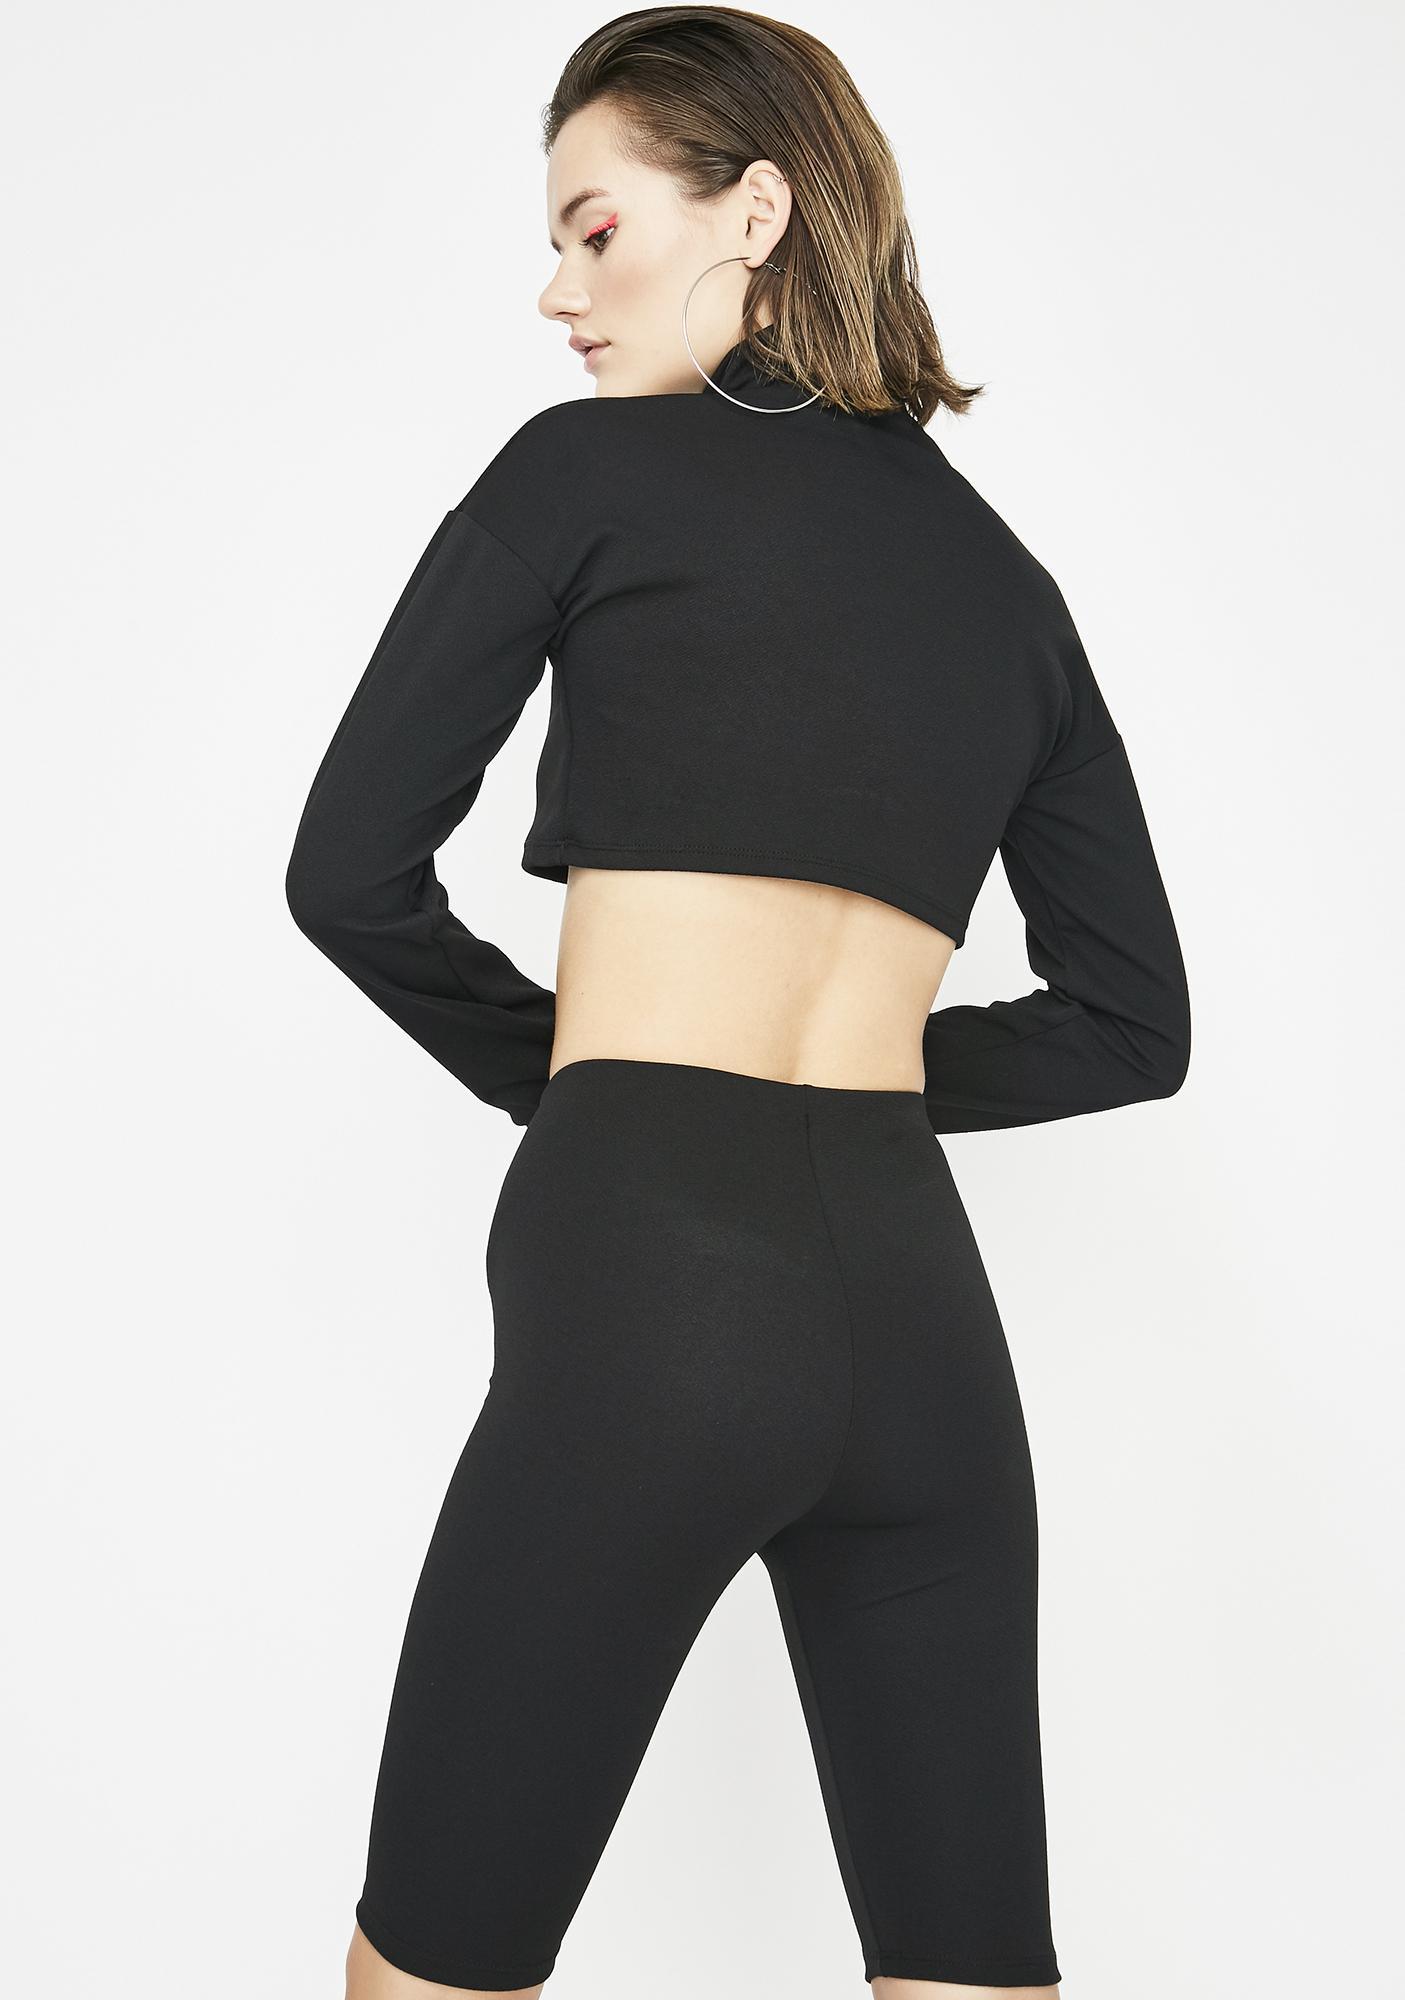 Say Less Biker Shorts Set